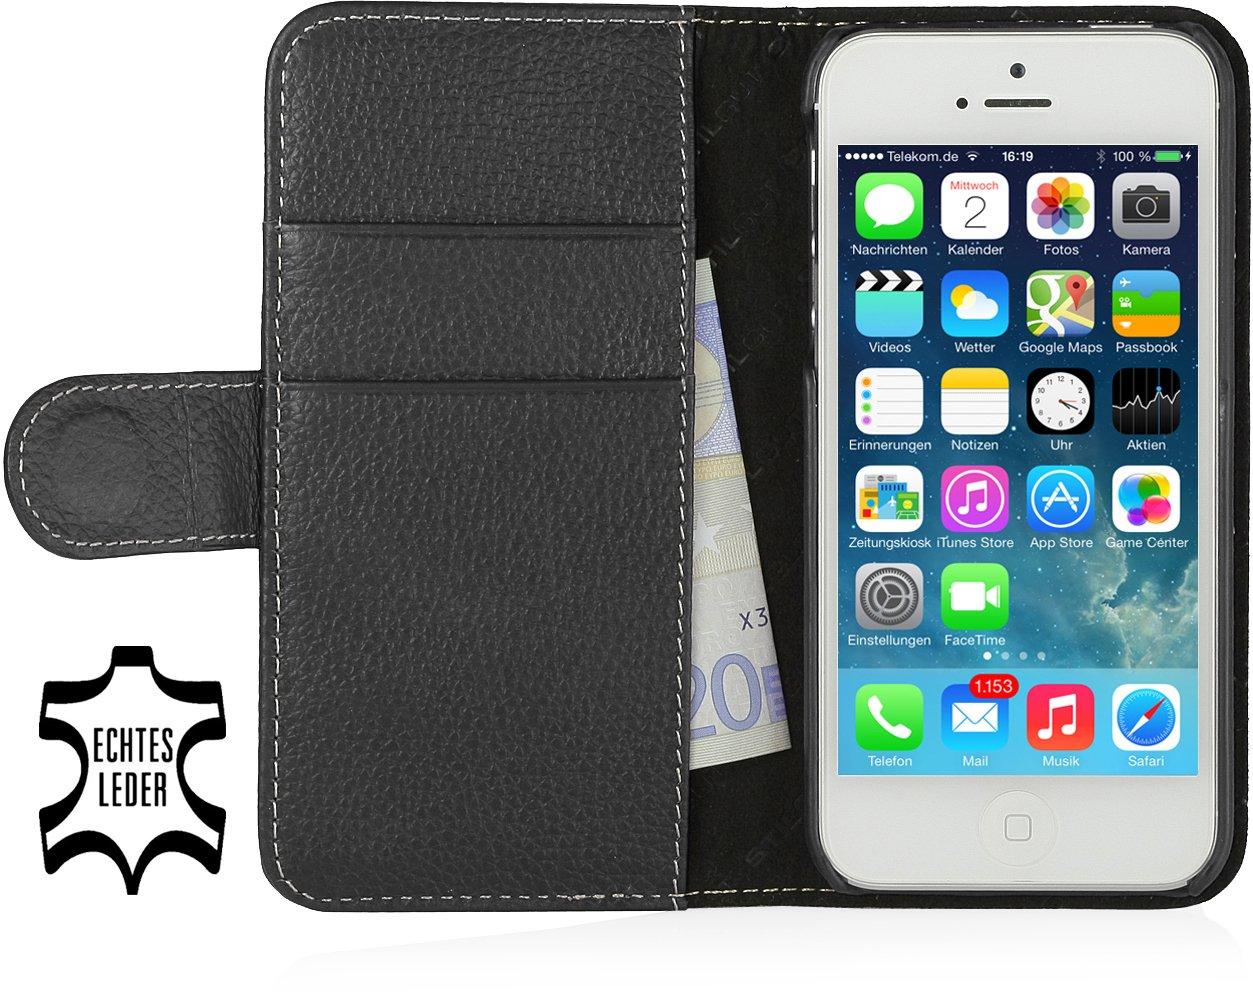 StilGut Ledertasche Case Talis V2 für das iPhone 5s